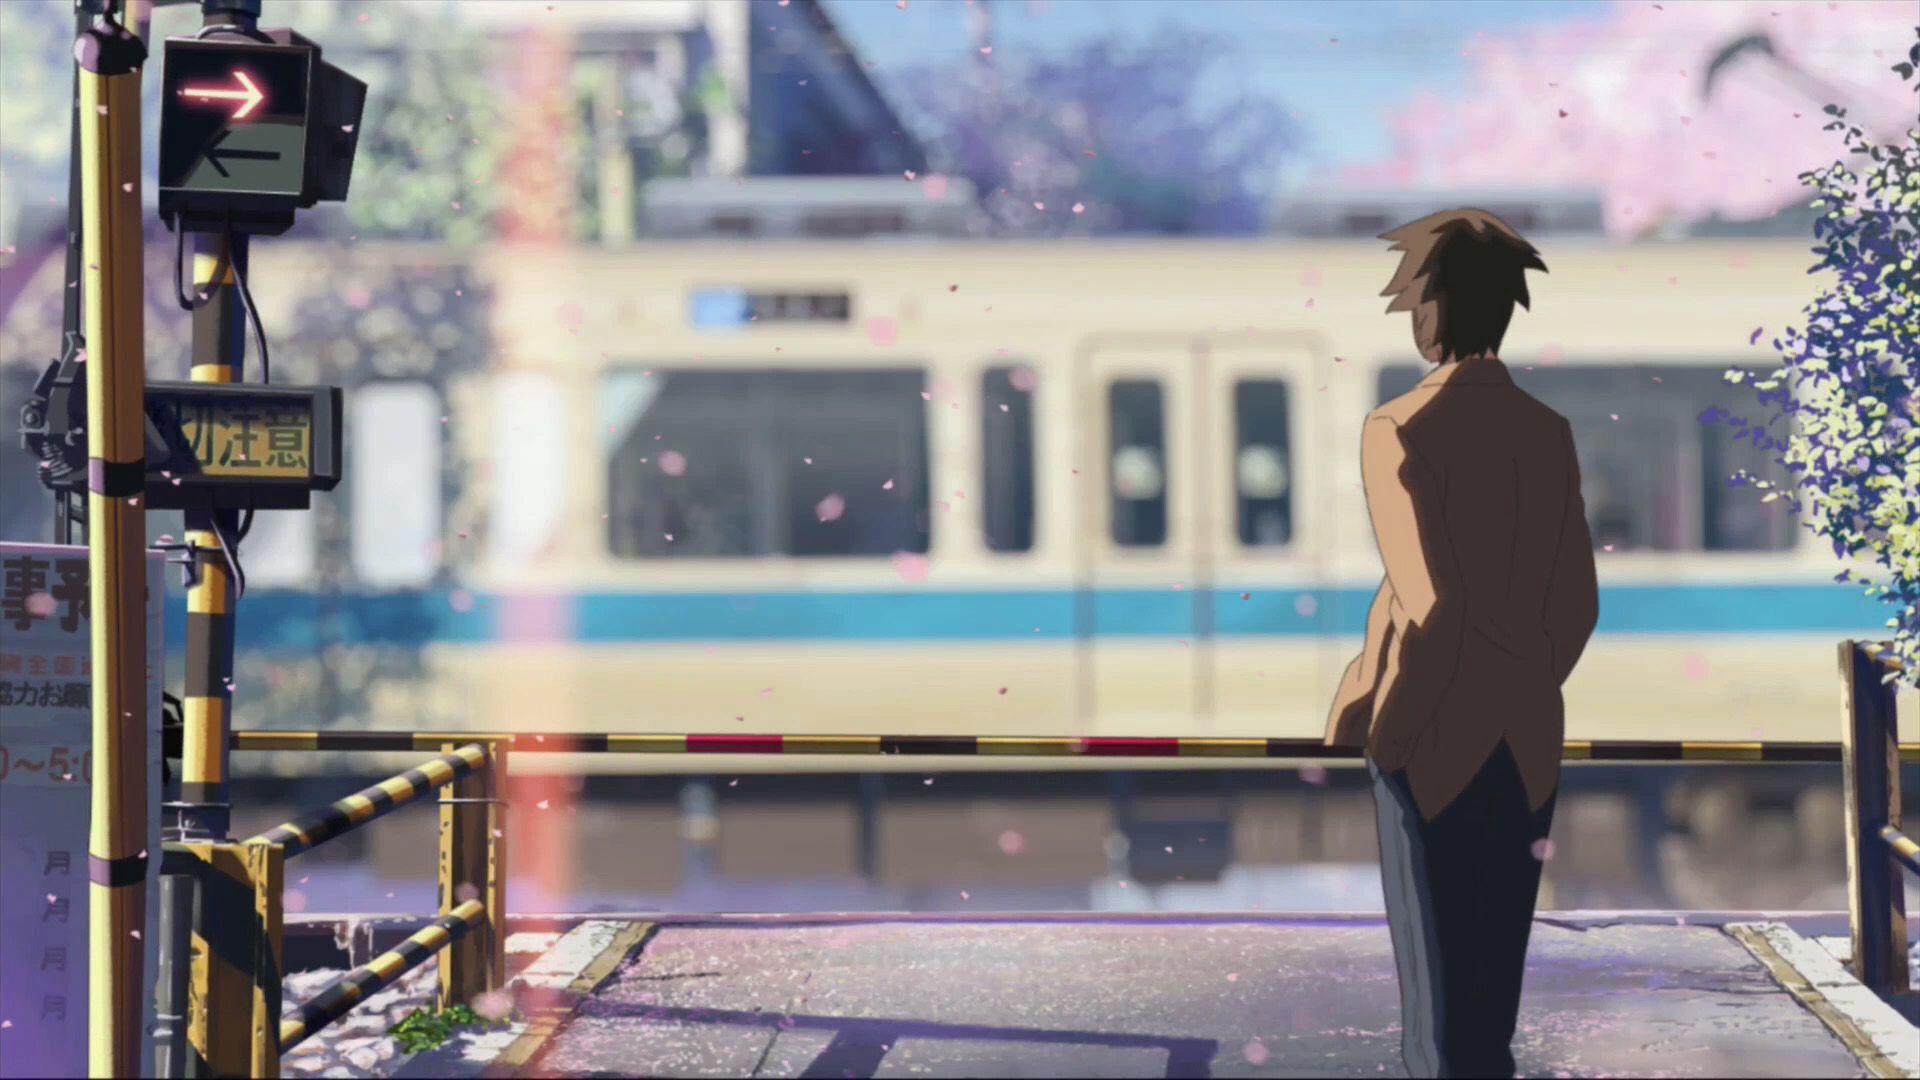 5 Centimeters Per Second Romantic anime, Anime scenery